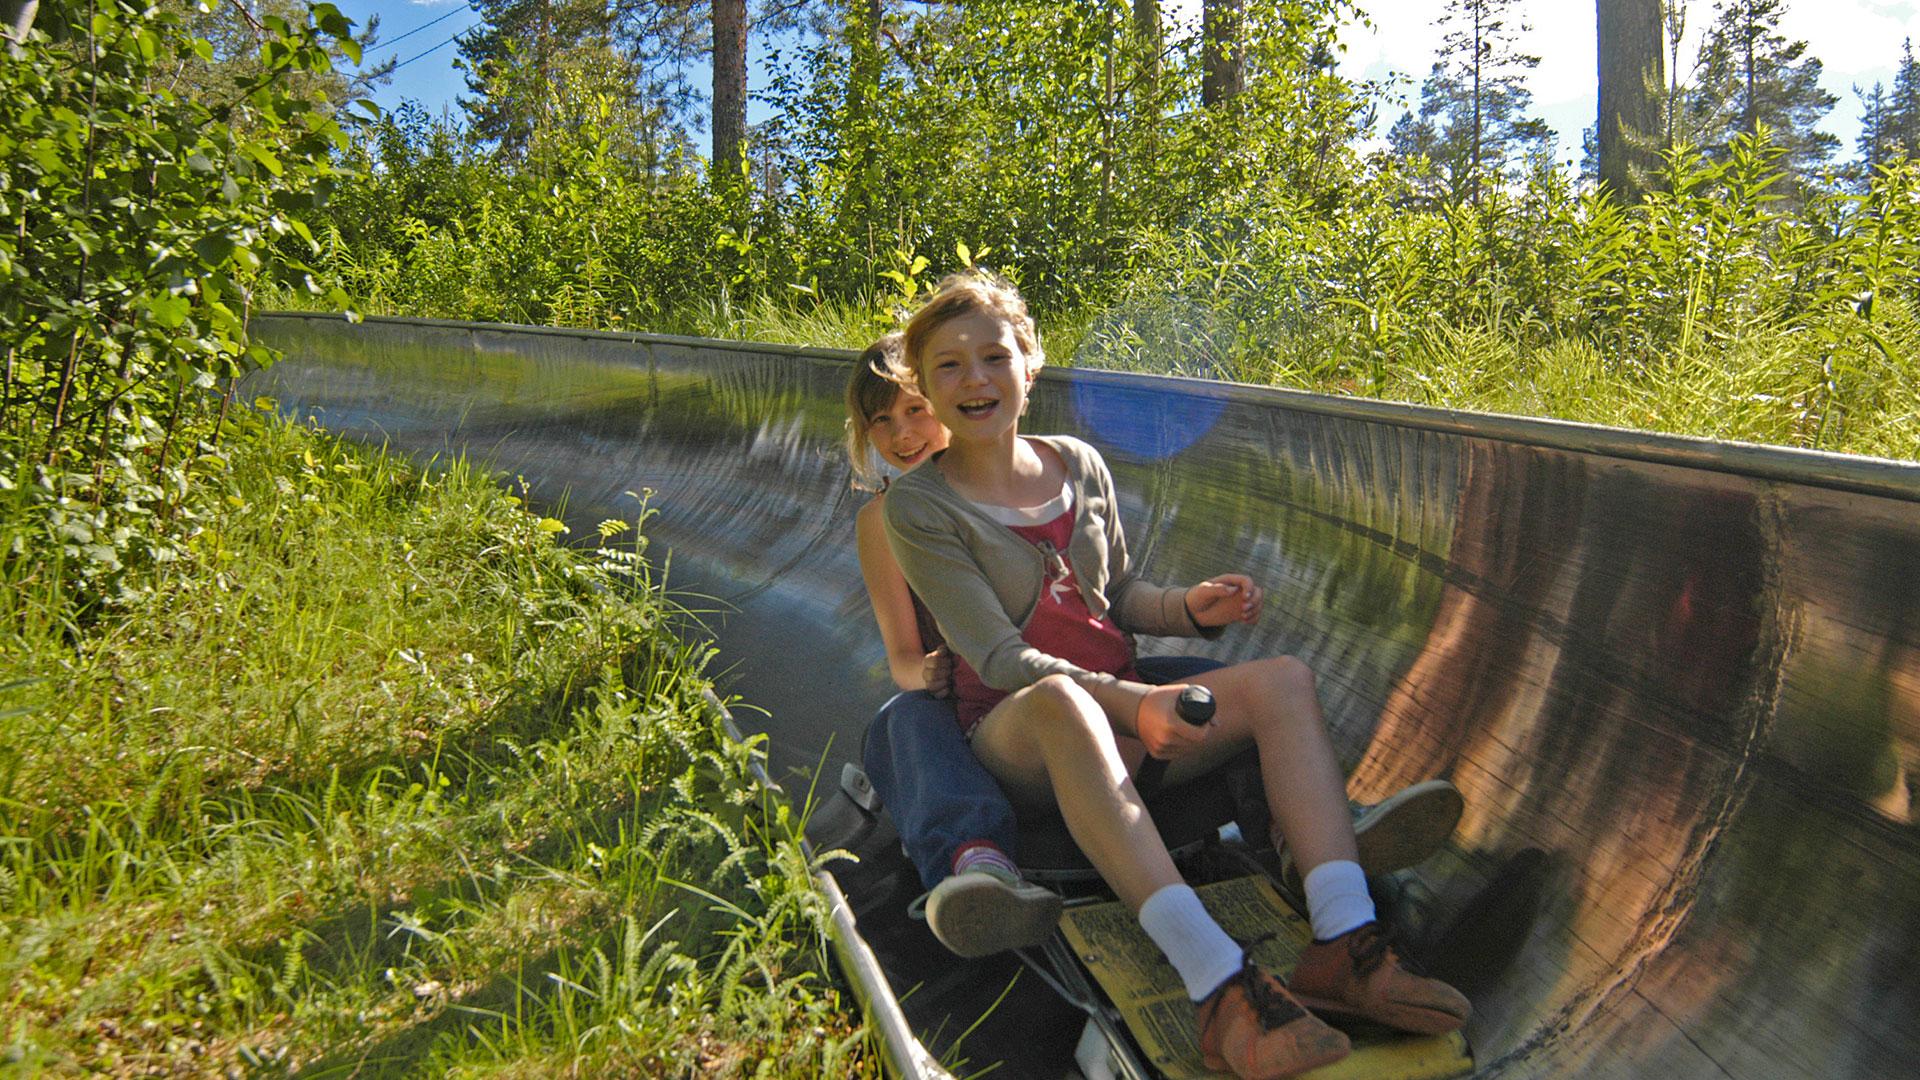 Summer bobsledding in Ounasvaara ski centre in Rovaniemi, Lapland, Finland